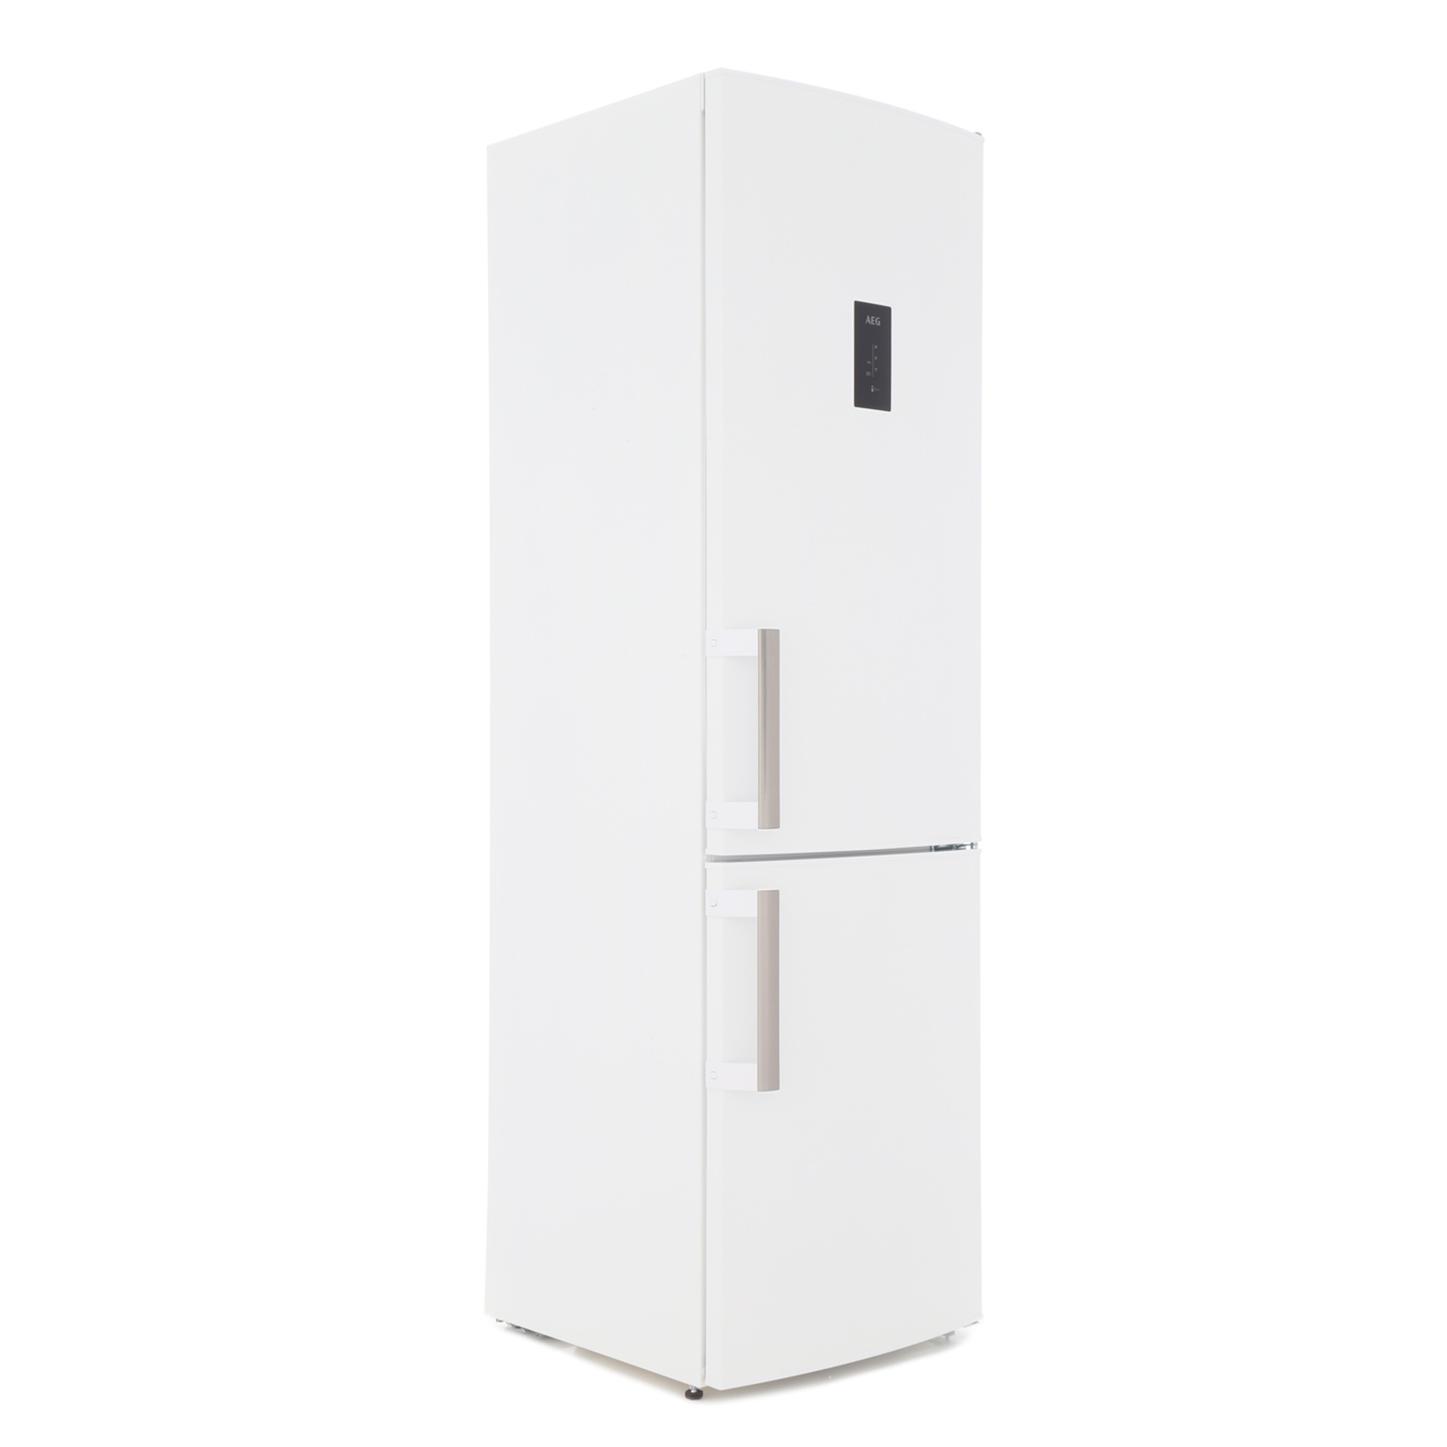 AEG RCB53724VW Frost Free Fridge Freezer